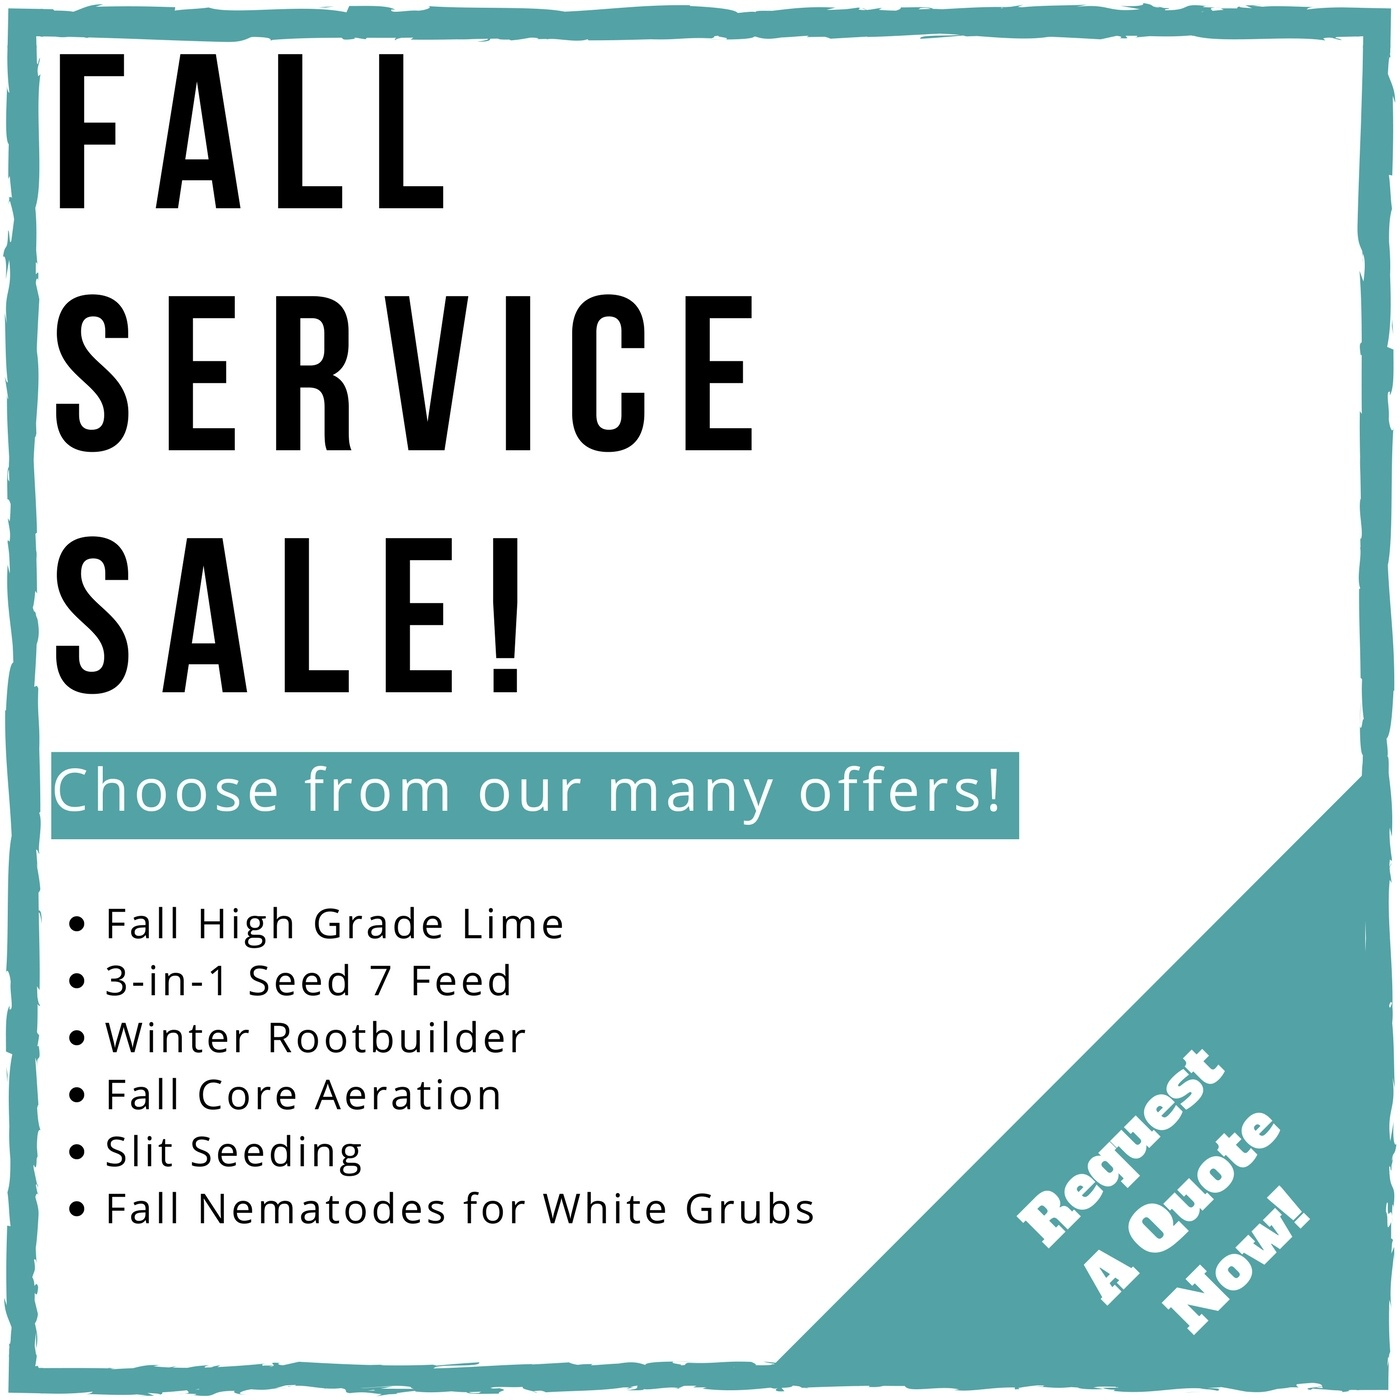 NL-Vancouver-2017-Fall-Service-Sale.jpg